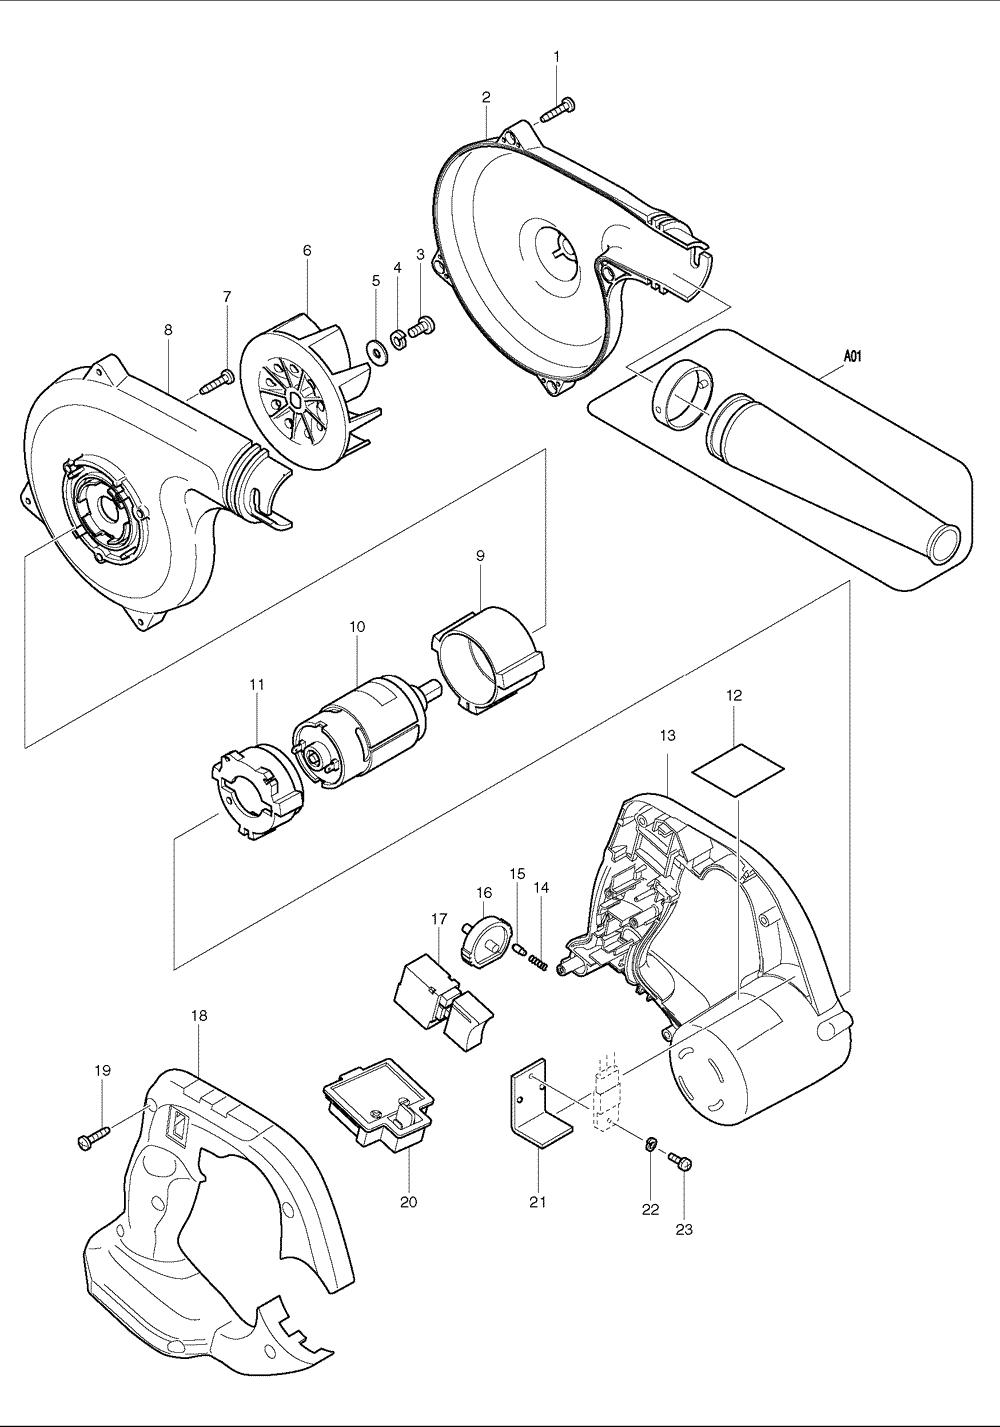 Switch Wiring Diagram For A Makita Bub182: Buy Makita BUB182 Replacement Tool Parts   Makita BUB182 Cordless    ,